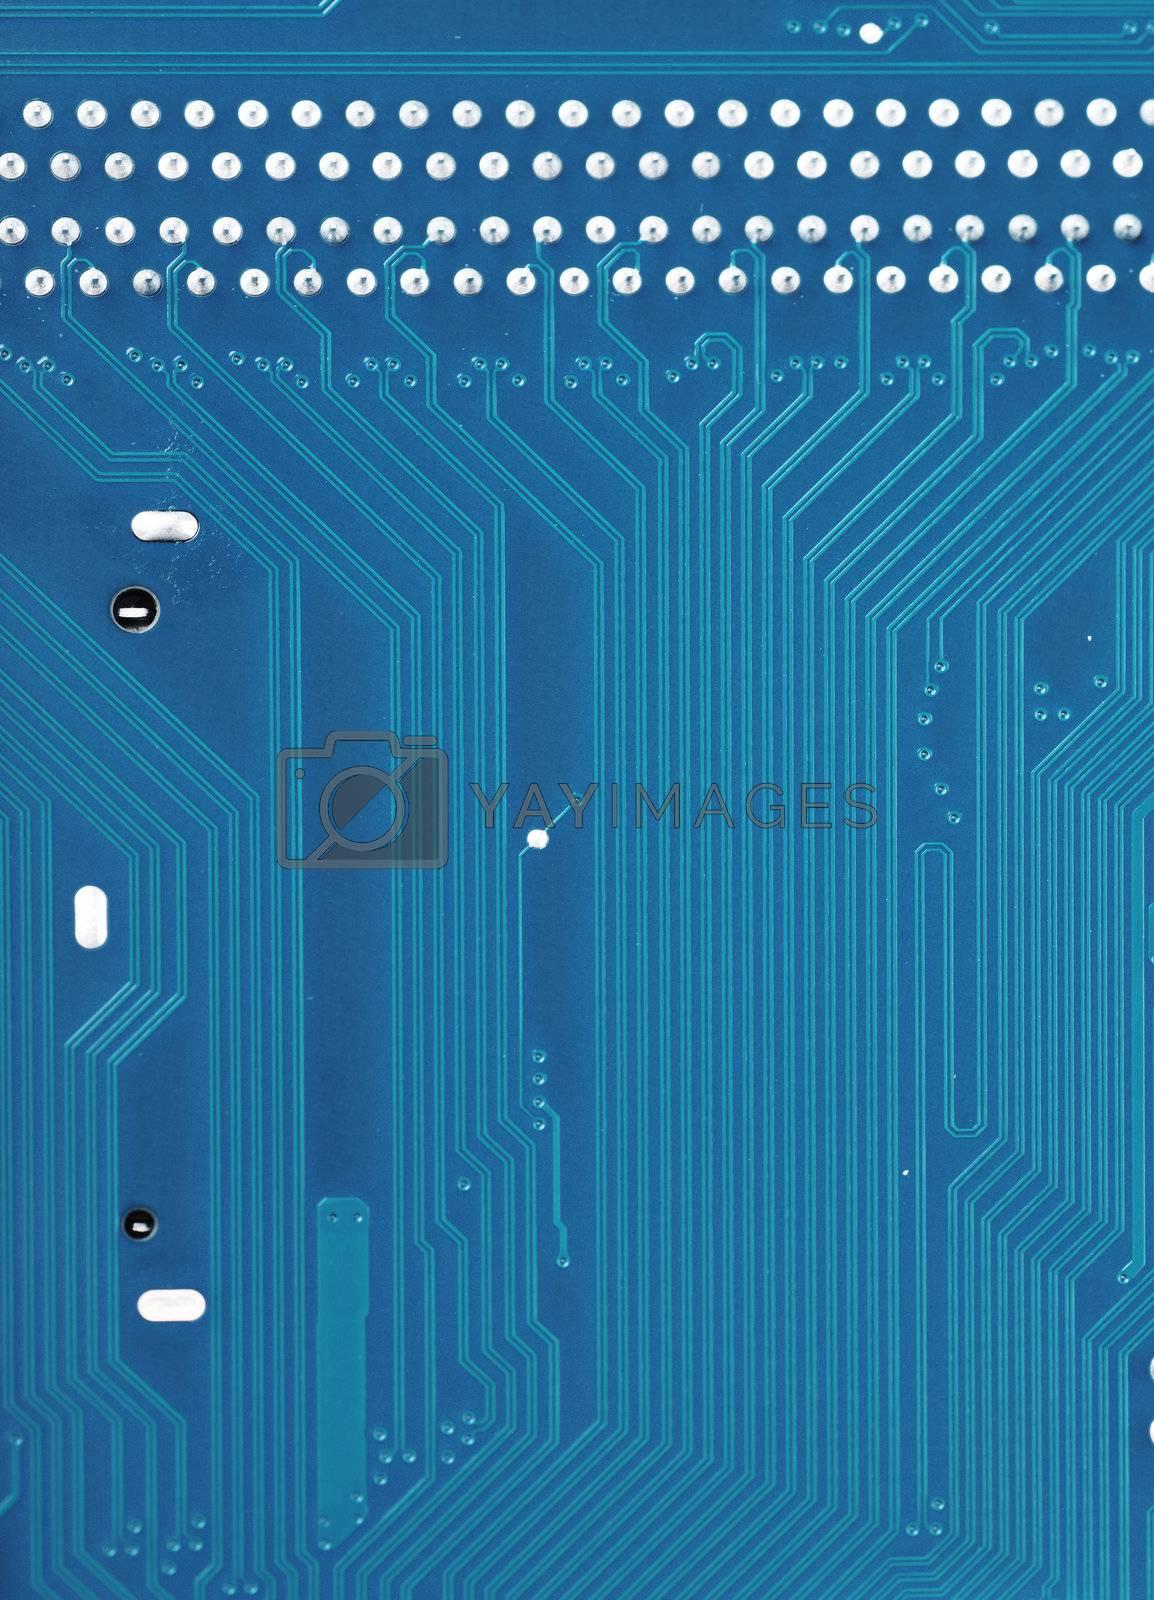 Closeup view of tracks of blue printed circuit board